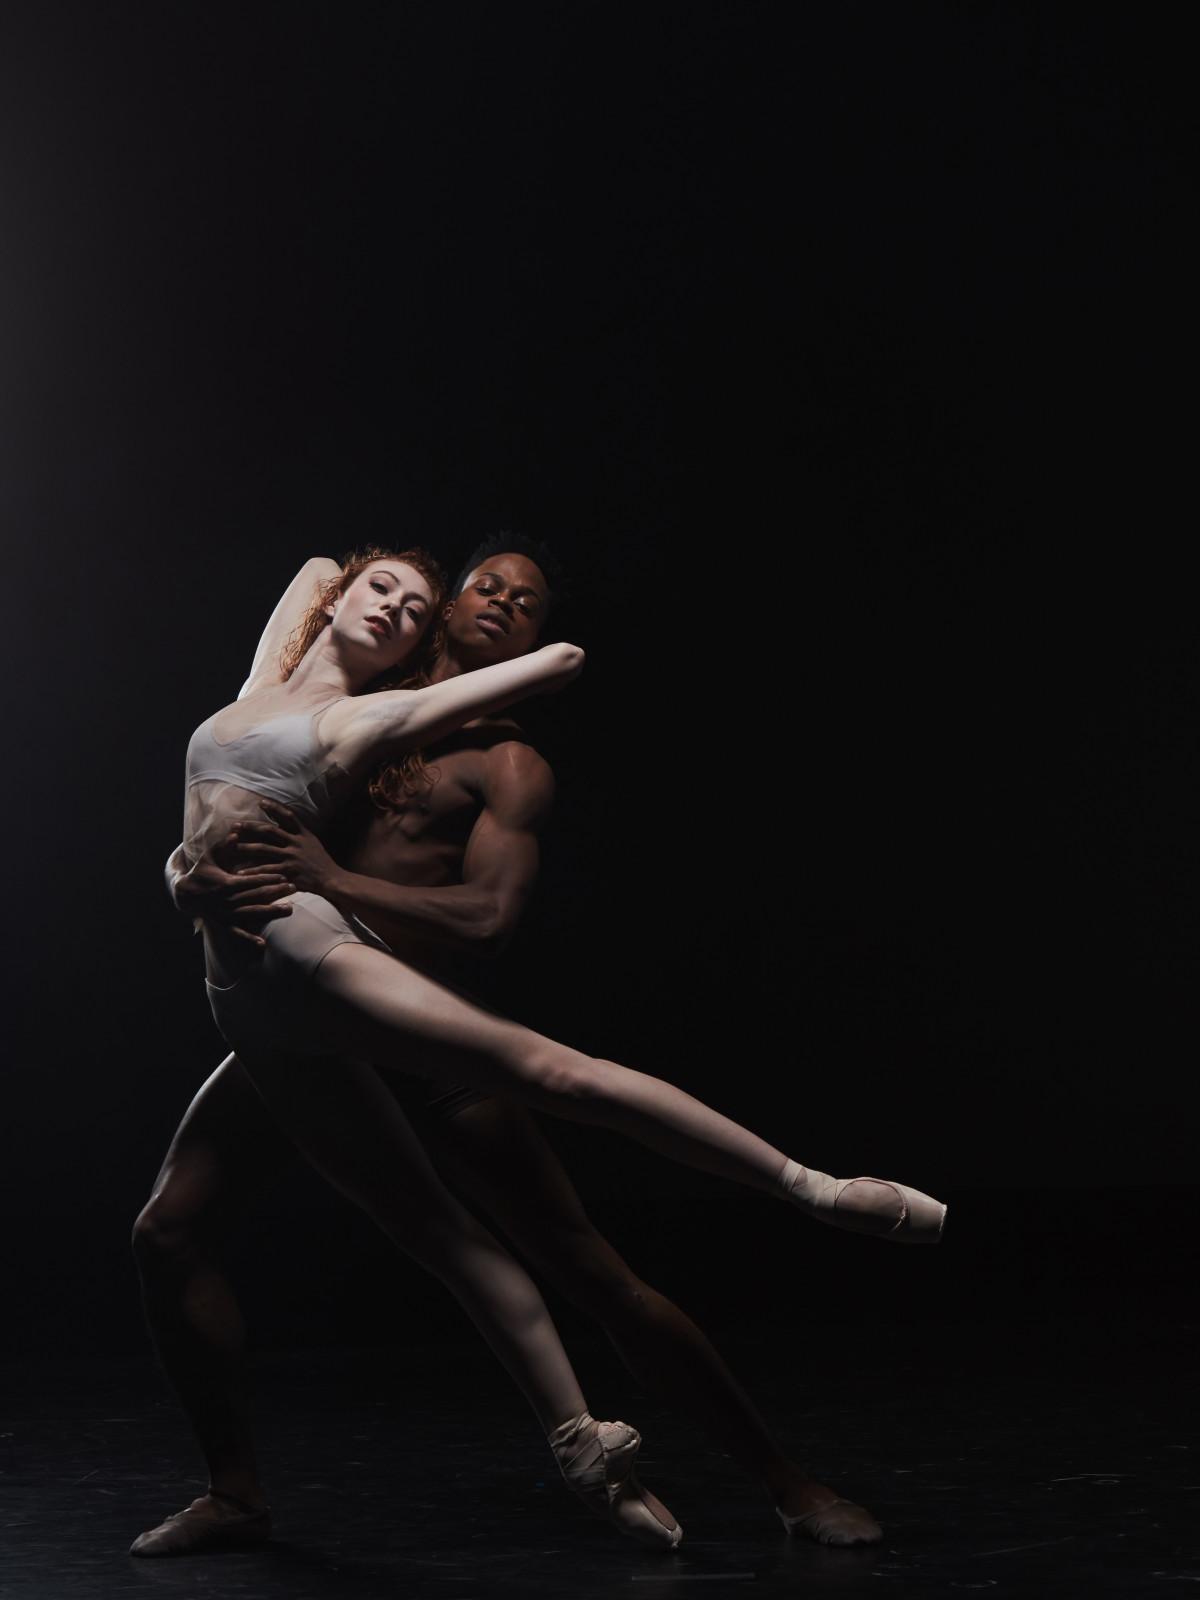 Houston Ballet: Premieres, Soloist Alyssa Springer and Corps de Ballet Naazir Muhuammad